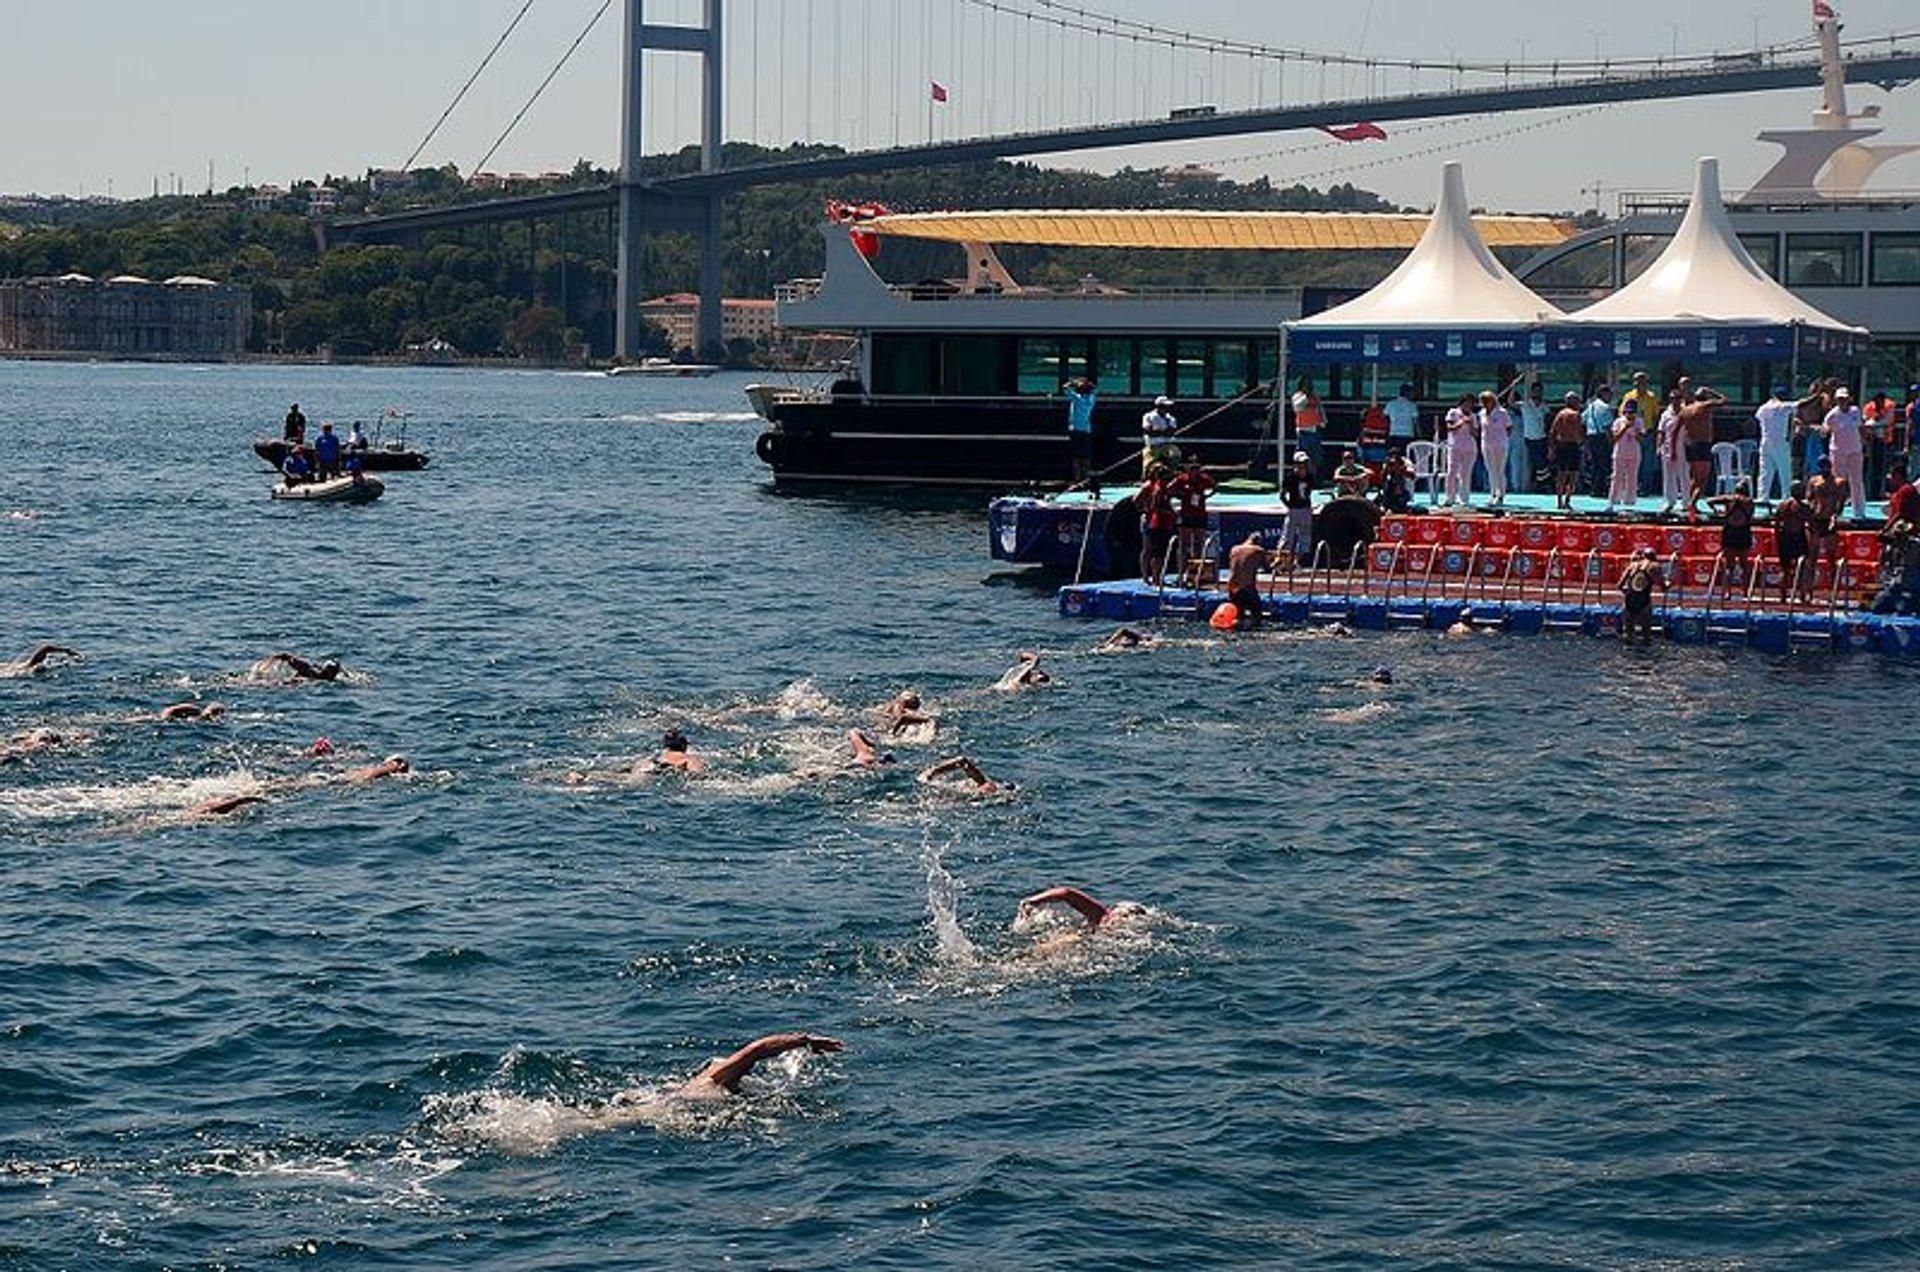 Finish phase at the 2016 Bosphorus Intercontinental Swim in Kuruçeşme